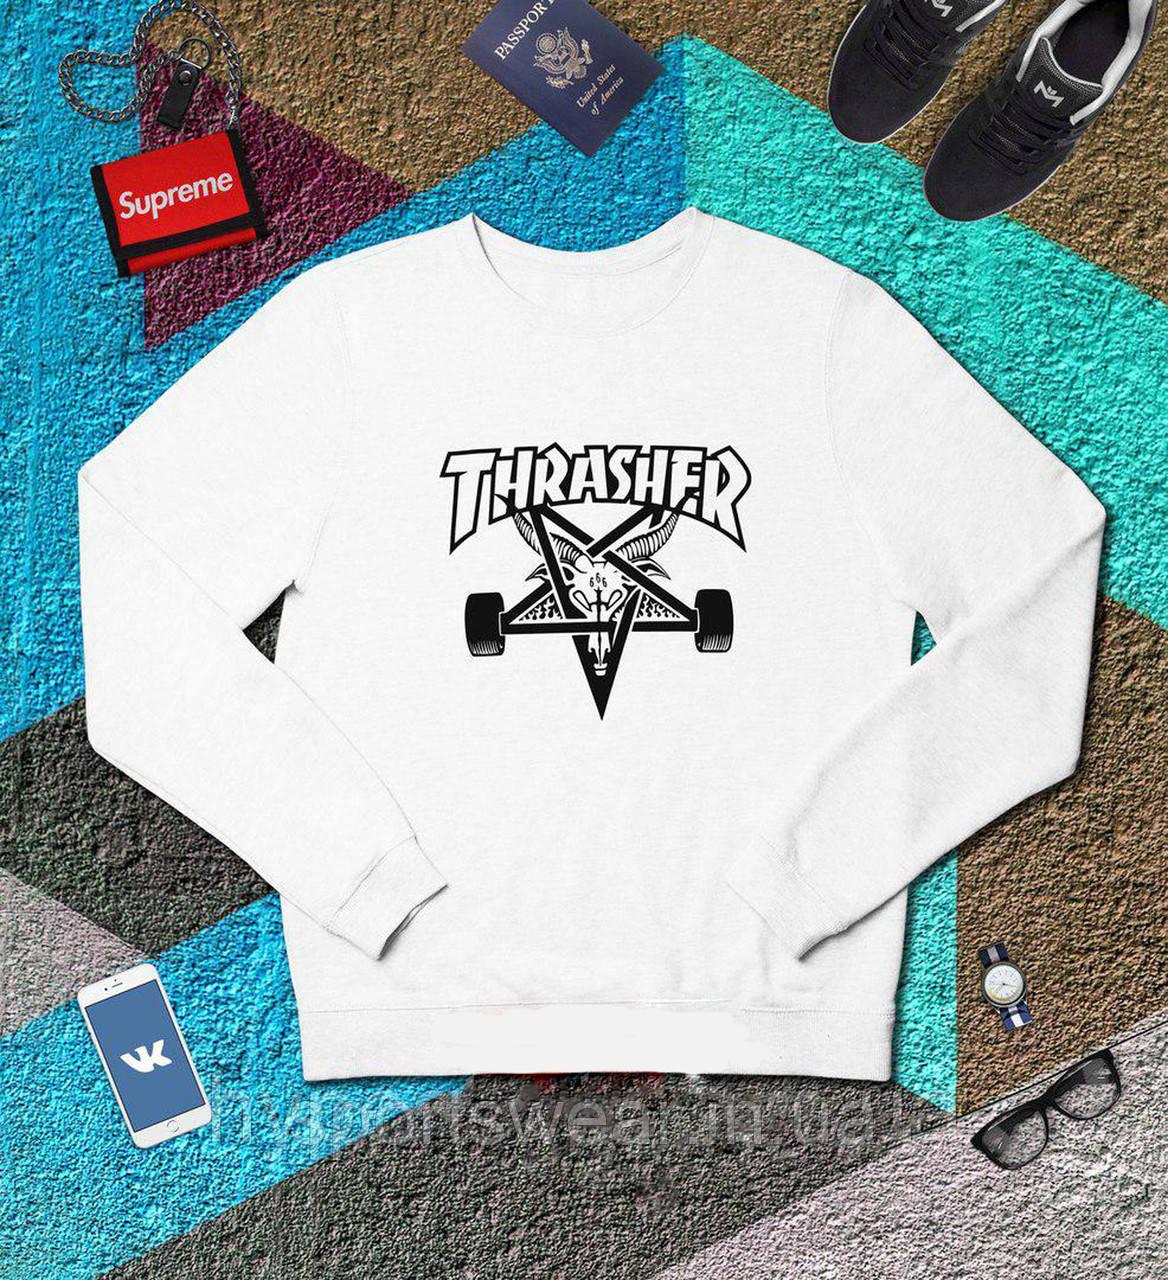 "Свитшот Thrasher Magazine| Кофта Трешер Белая """" В стиле Thrasher """""